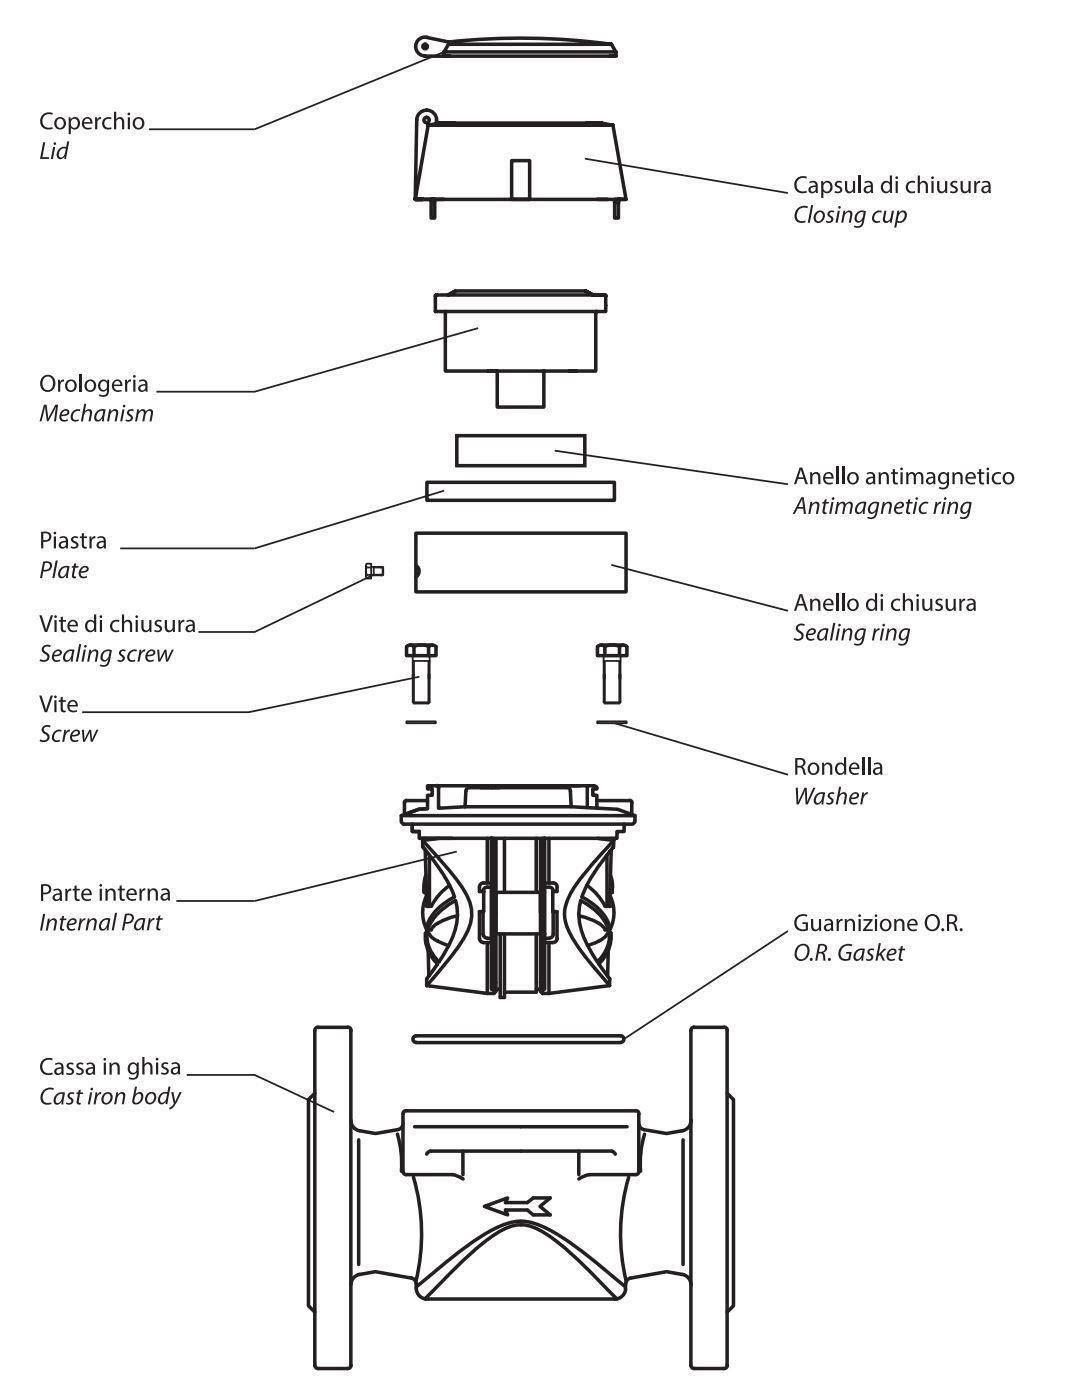 4 BSP European Thread Resistant Cast Iron Industrial Water Meter Flow Counter for Cold Water